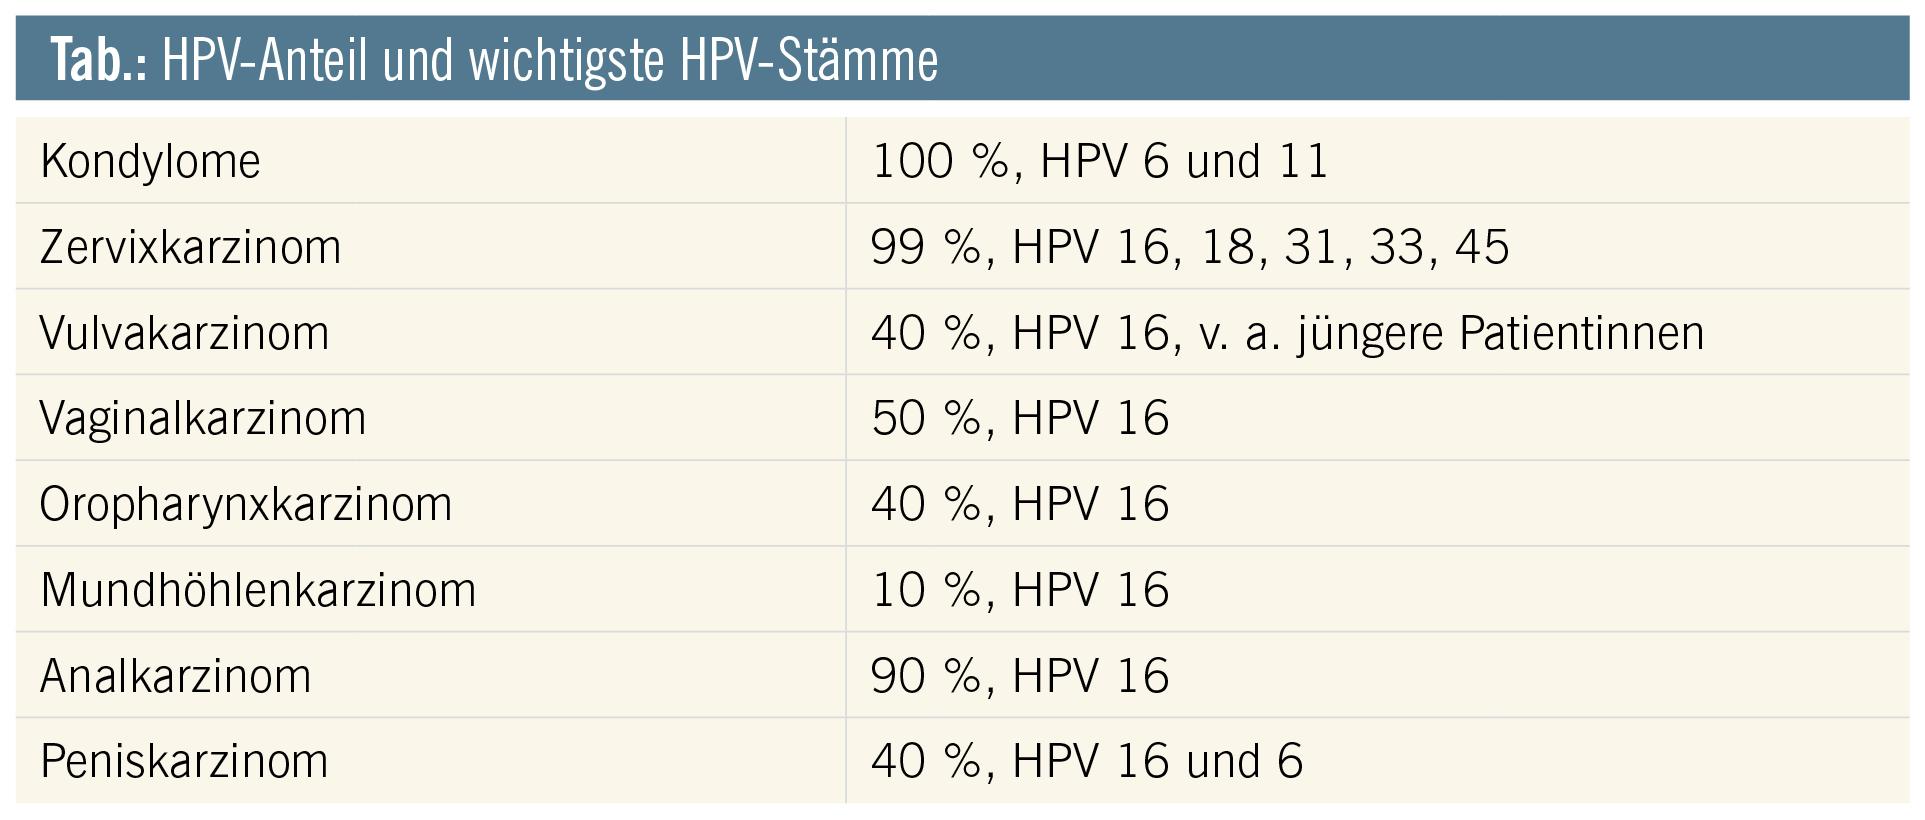 Hpv impfung graz. Hpv impfung graz - Verme oxiurus sintomas tratamento Verme oxiurus pega